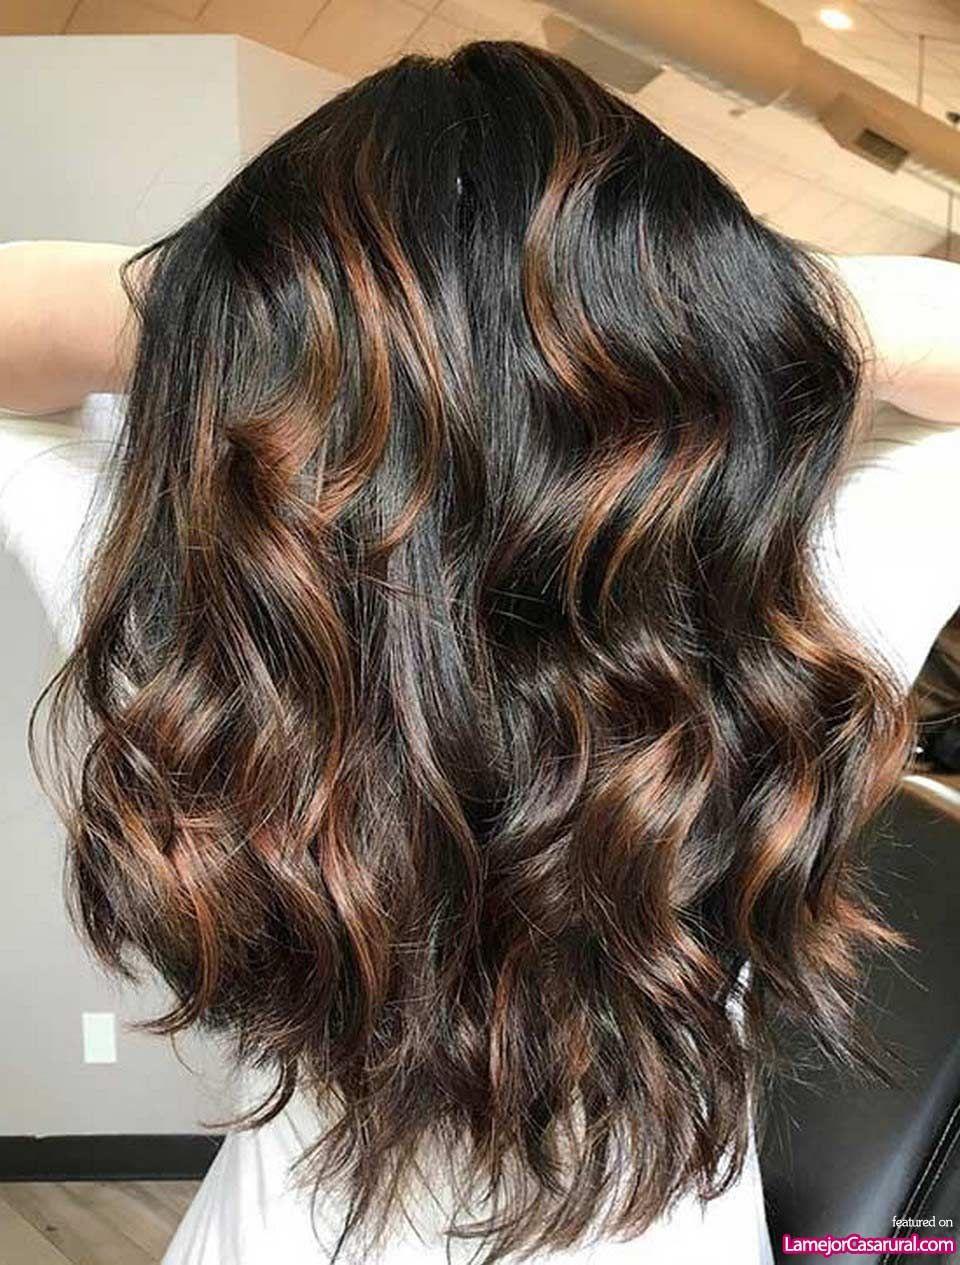 Awesome Caramel Highlights On Jet Black Hair Hair Highlights Black Hair With Highlights Caramel Highlights